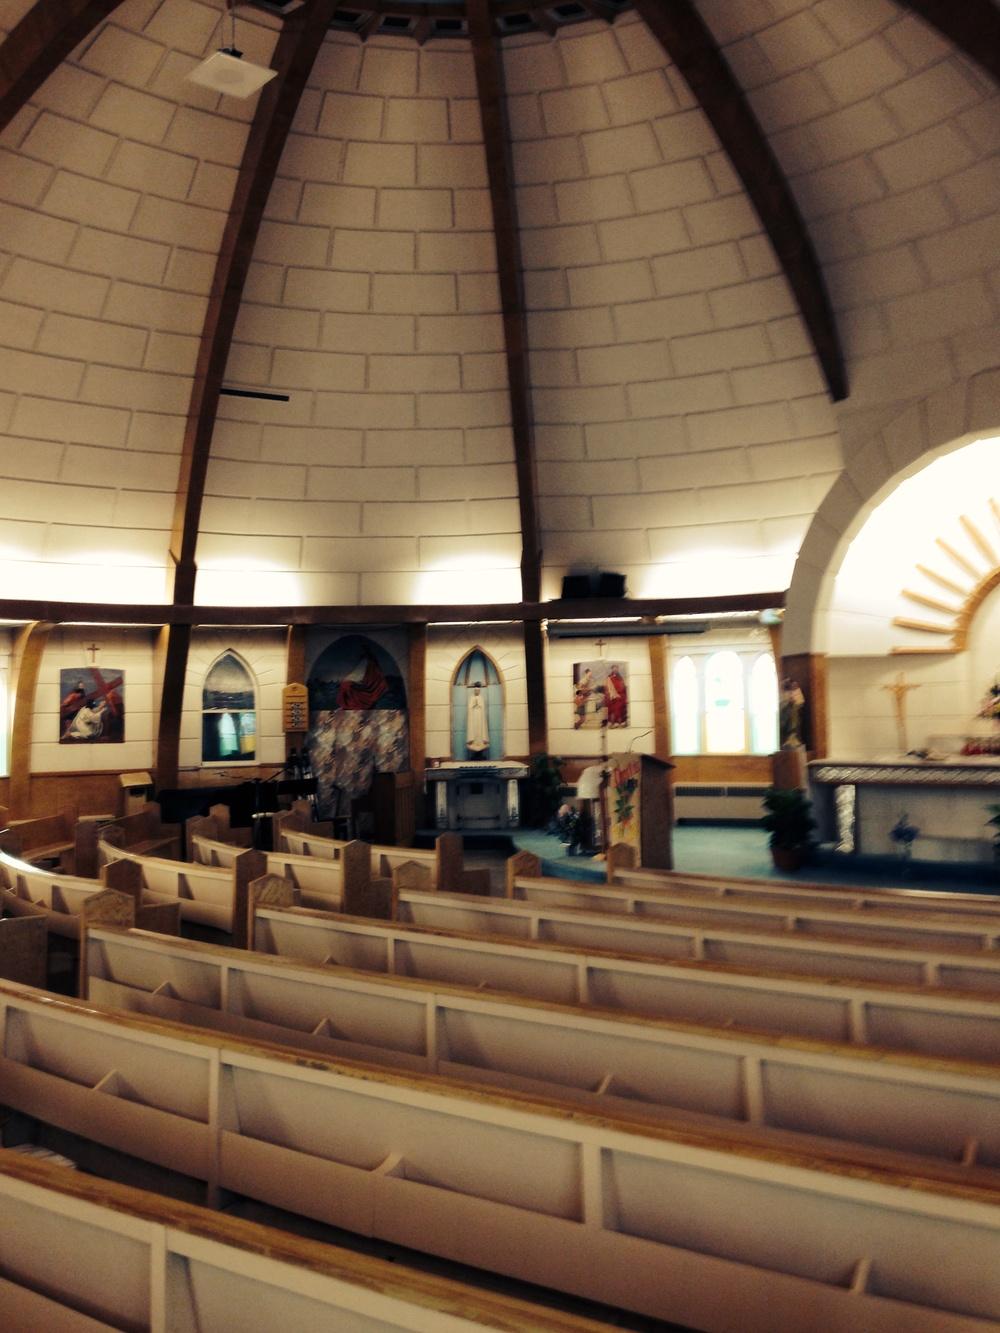 Inside the Igloo Church